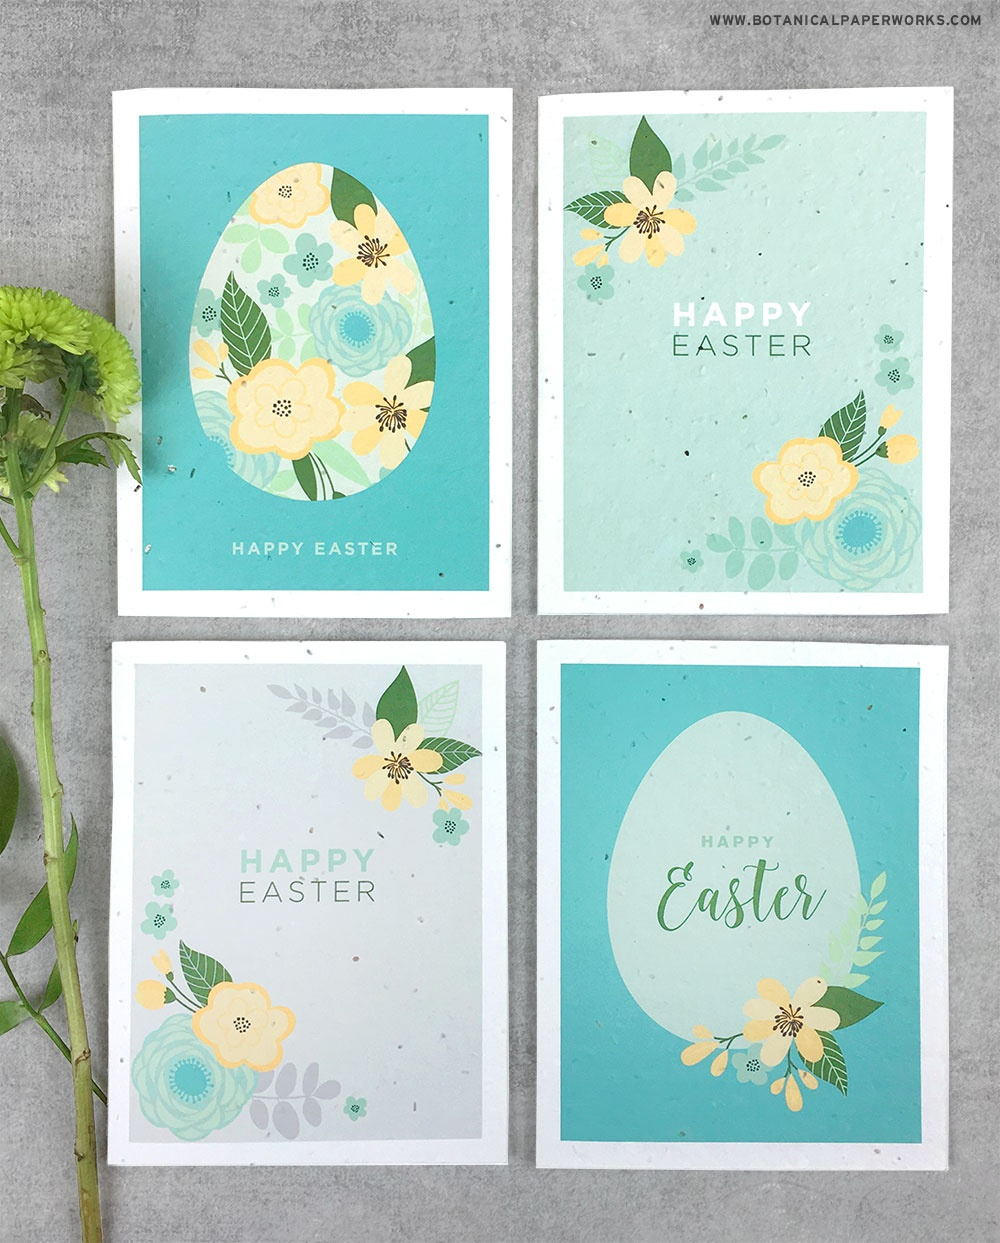 Free Printable} Easter Cards   Blog   Botanical Paperworks - Free Printable Easter Cards